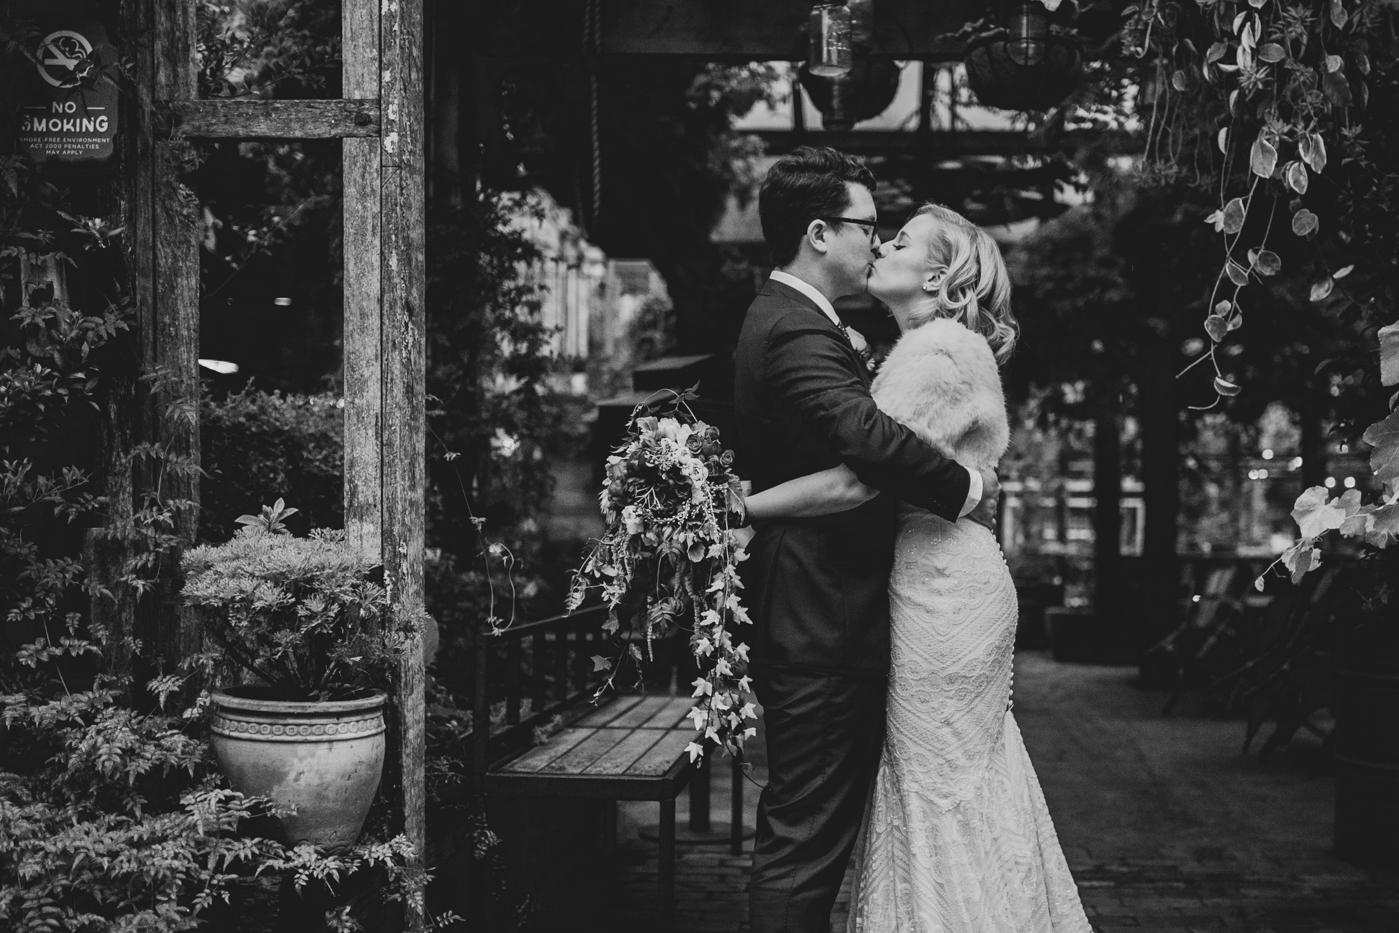 Jo & Tom Wedding - The Grounds of Alexandria - Samantha Heather Photography-240.jpg